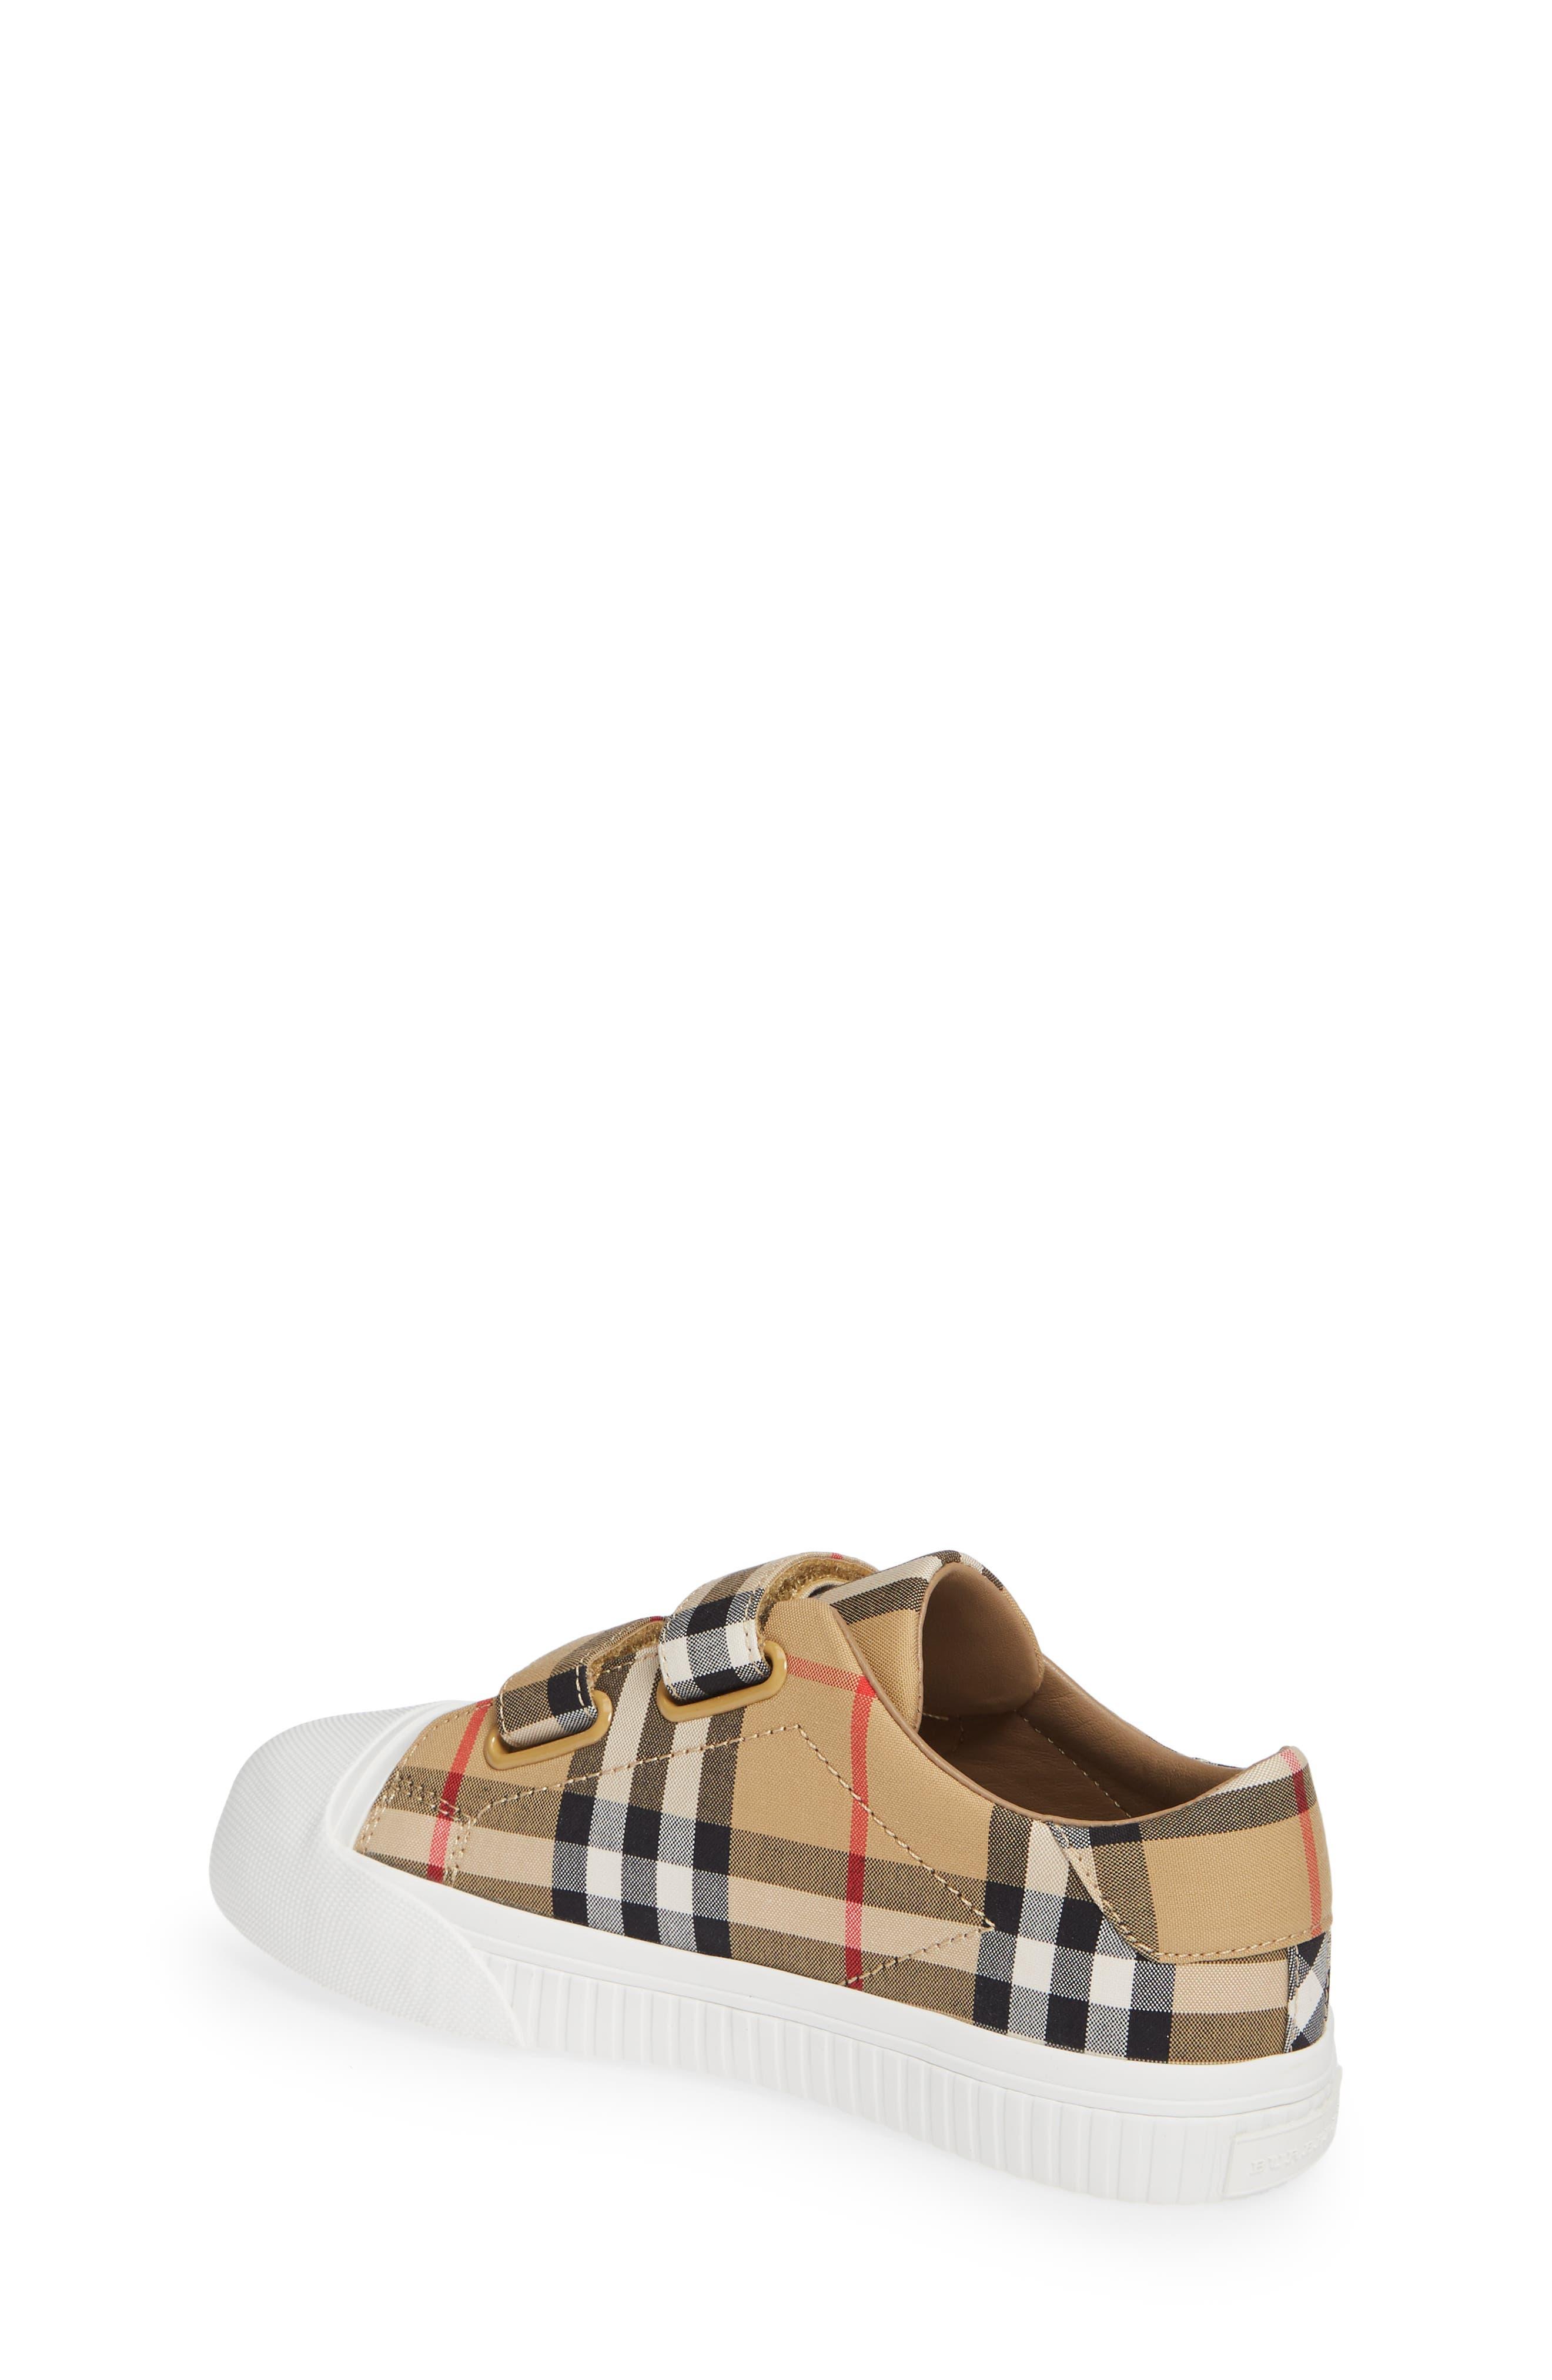 BURBERRY, Belside Sneaker, Alternate thumbnail 2, color, ANTIQUE YELLOW-OPTIC WHITE